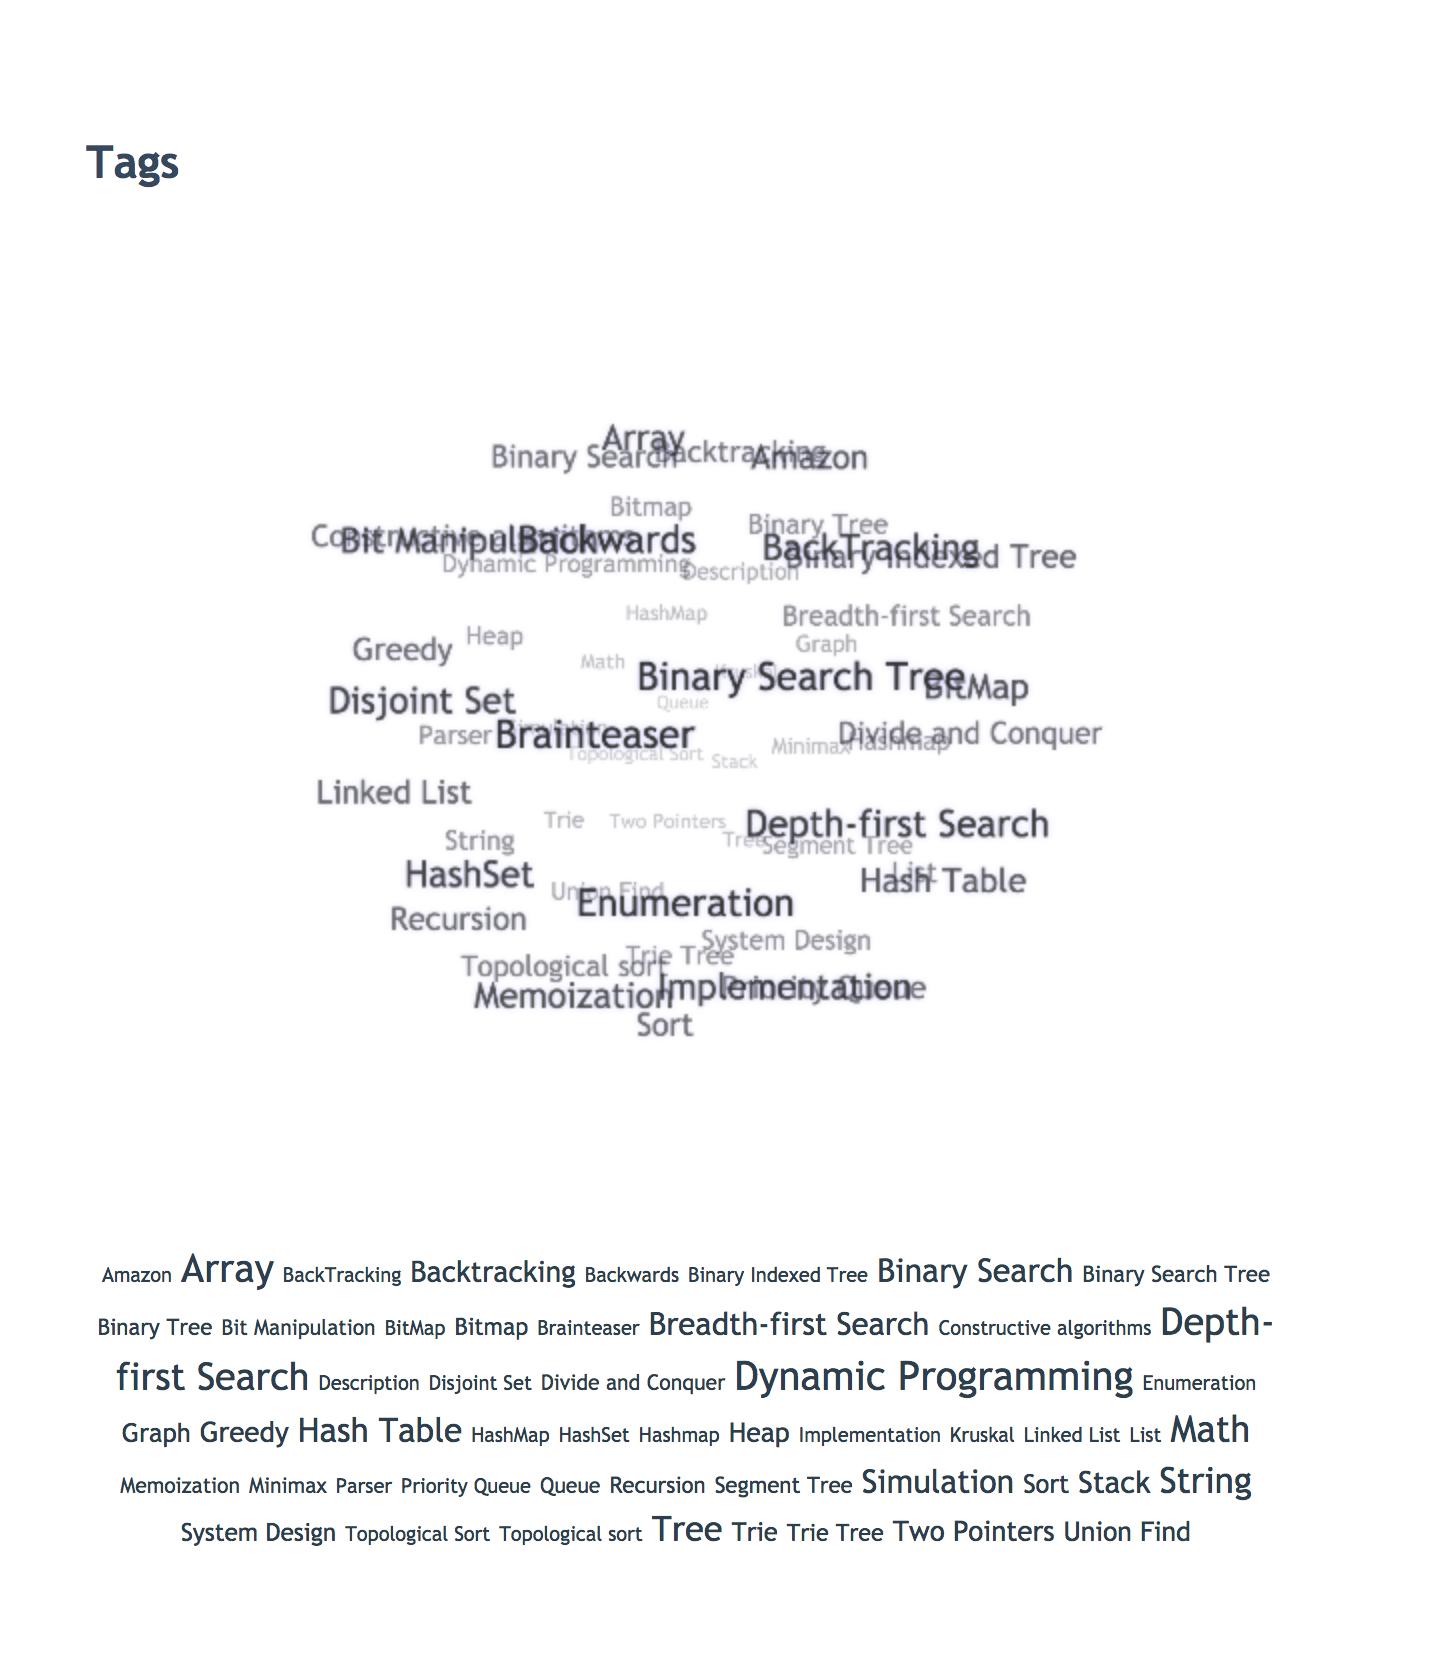 hexo-tag-cloud - npm